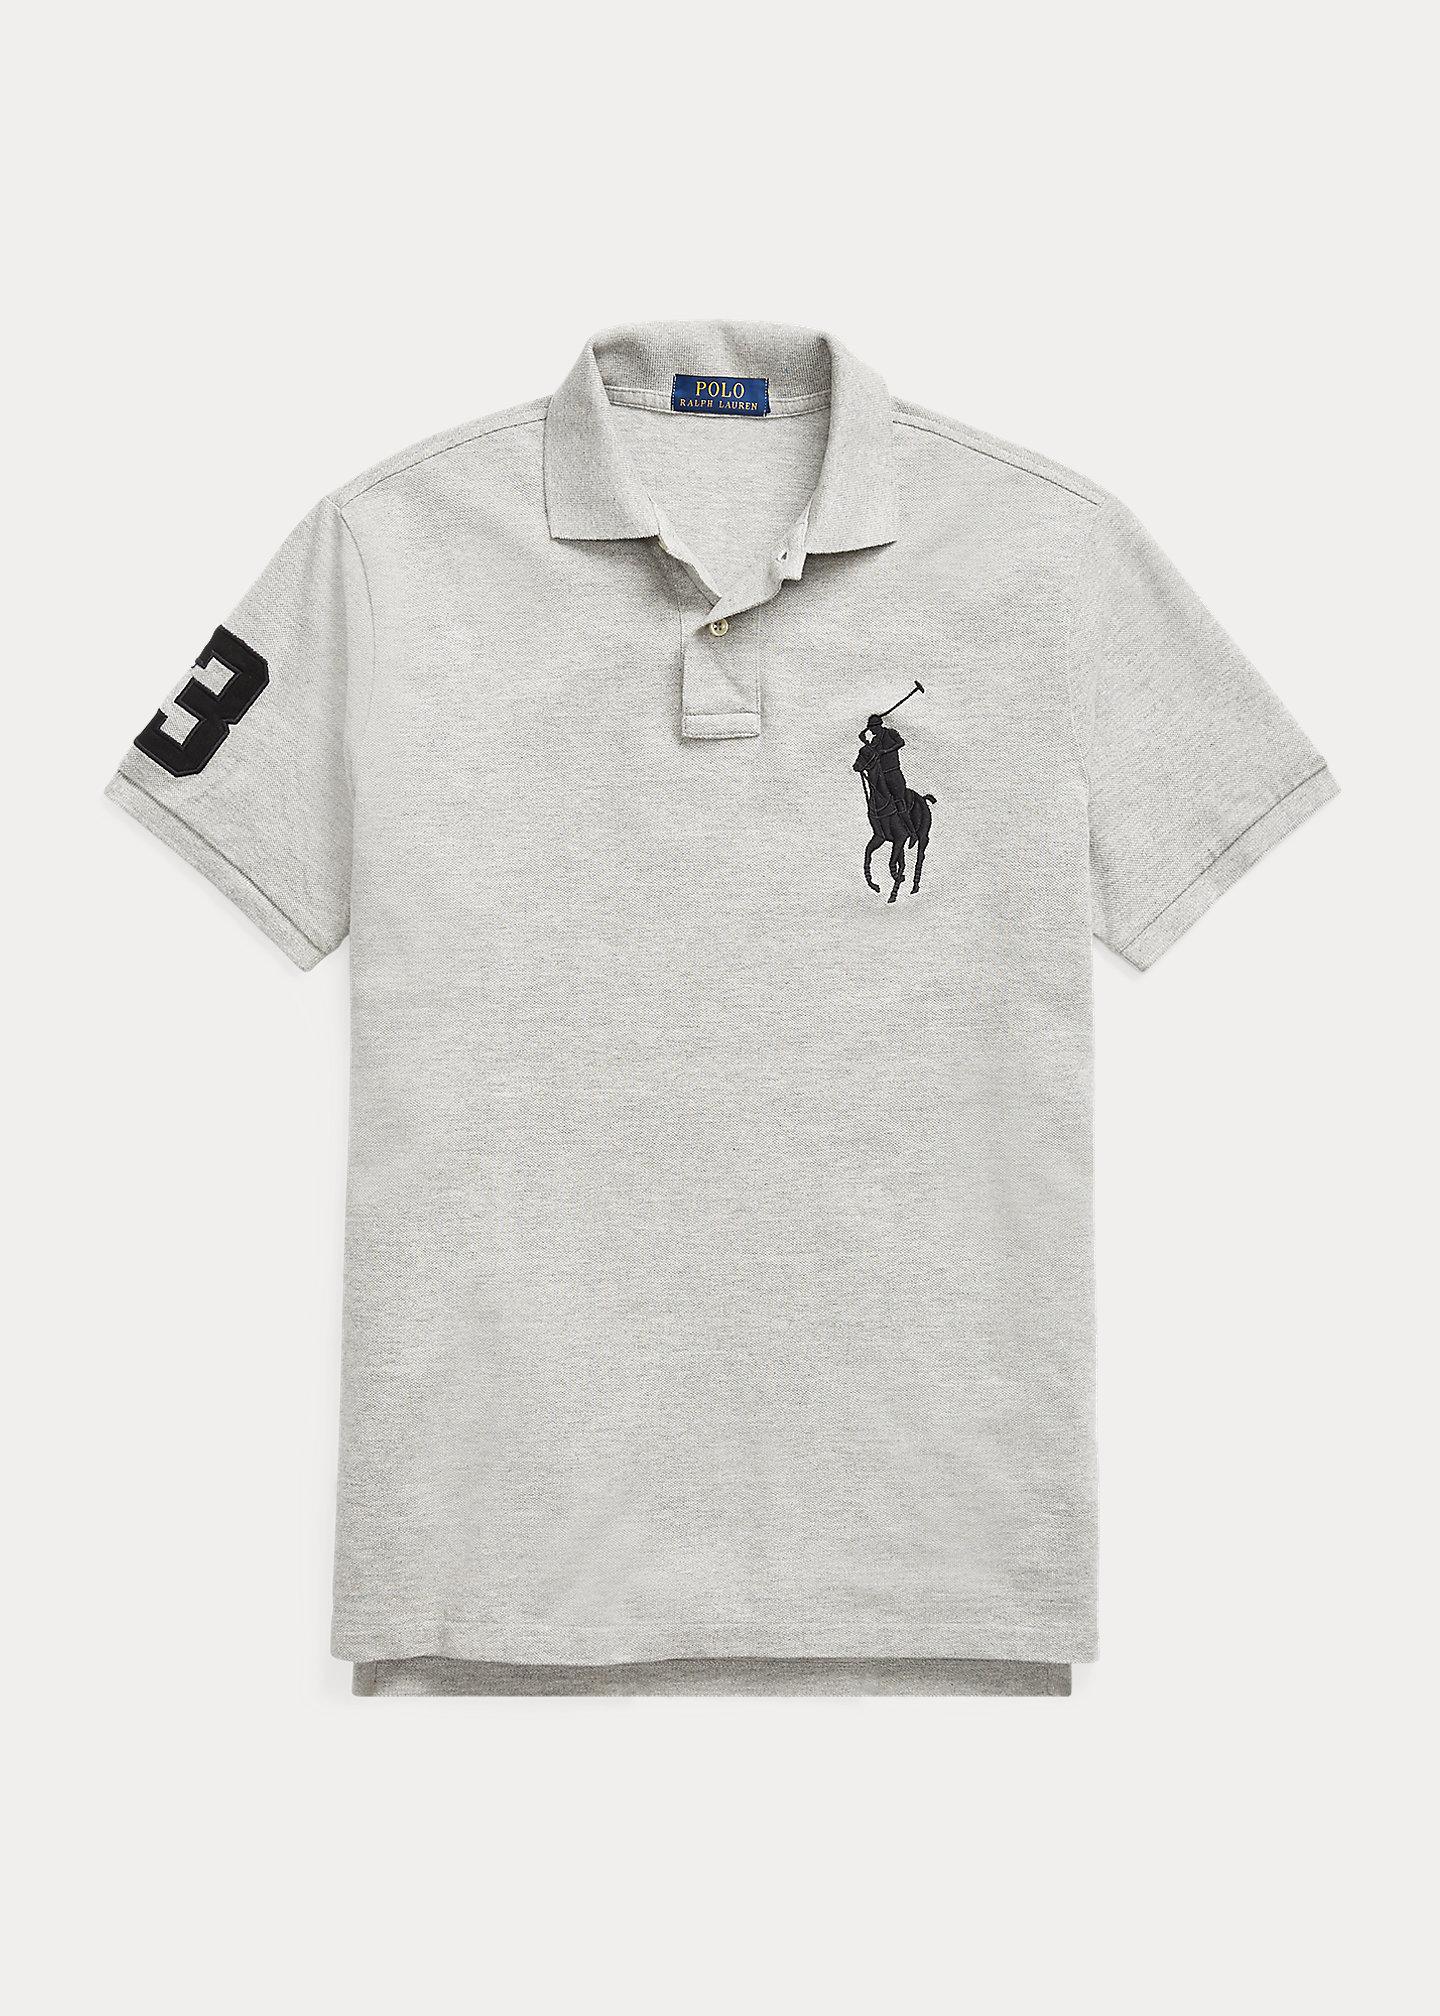 Polo Ralph Lauren Custom Slim Fit Mesh Polo 2